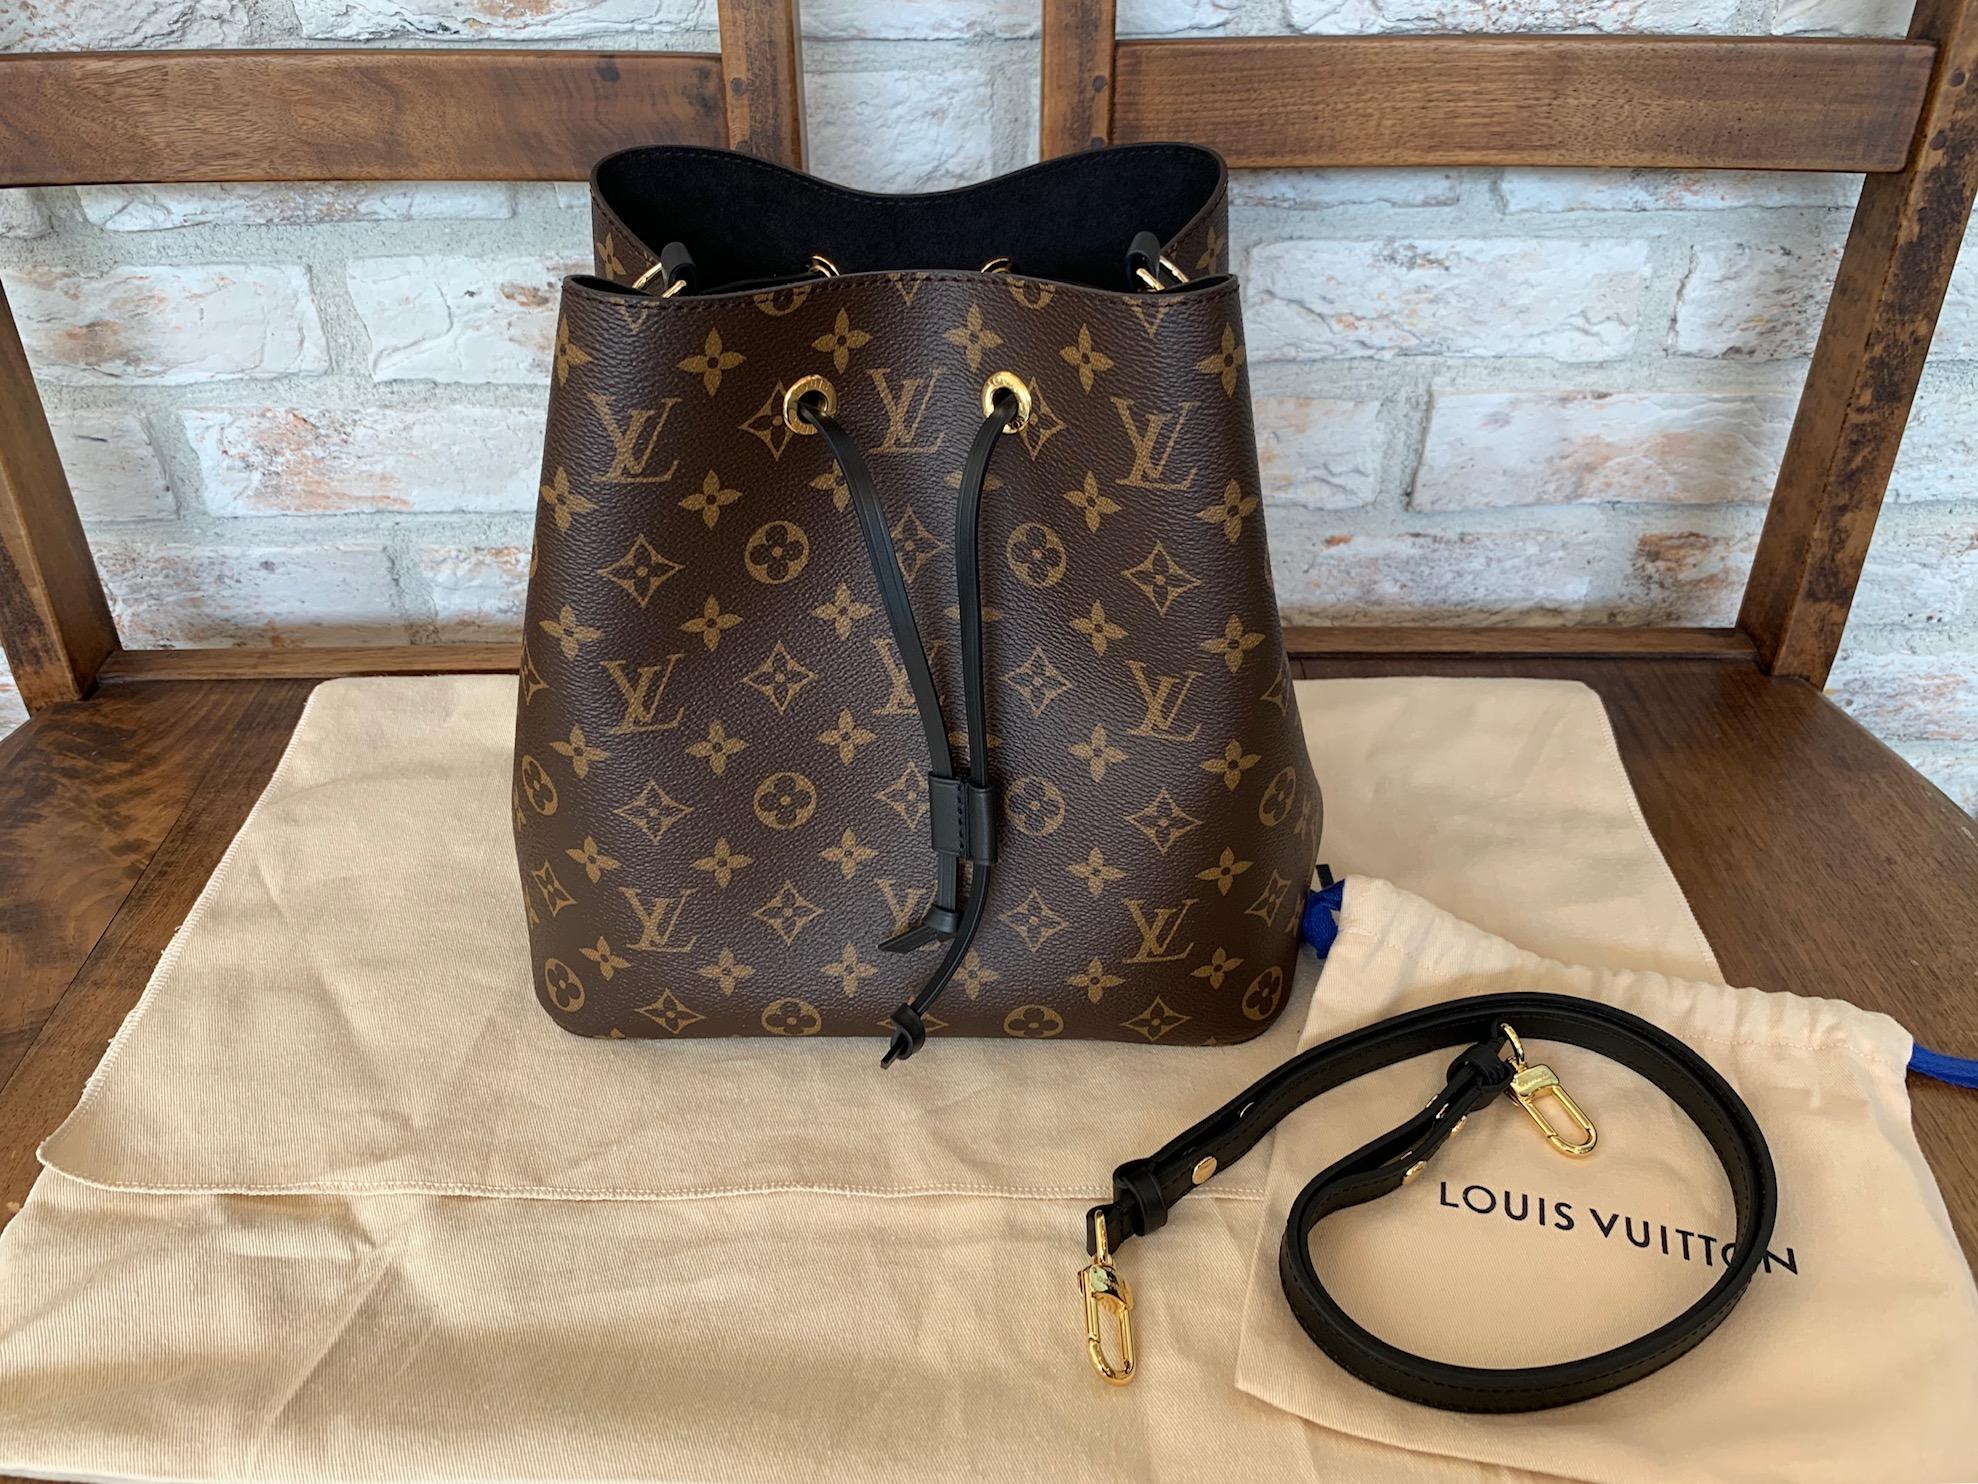 online store 1d061 09c63 LV(ルイヴィトン)の人気商品、巾着バッグ『ネオノエ』高価買取 ...